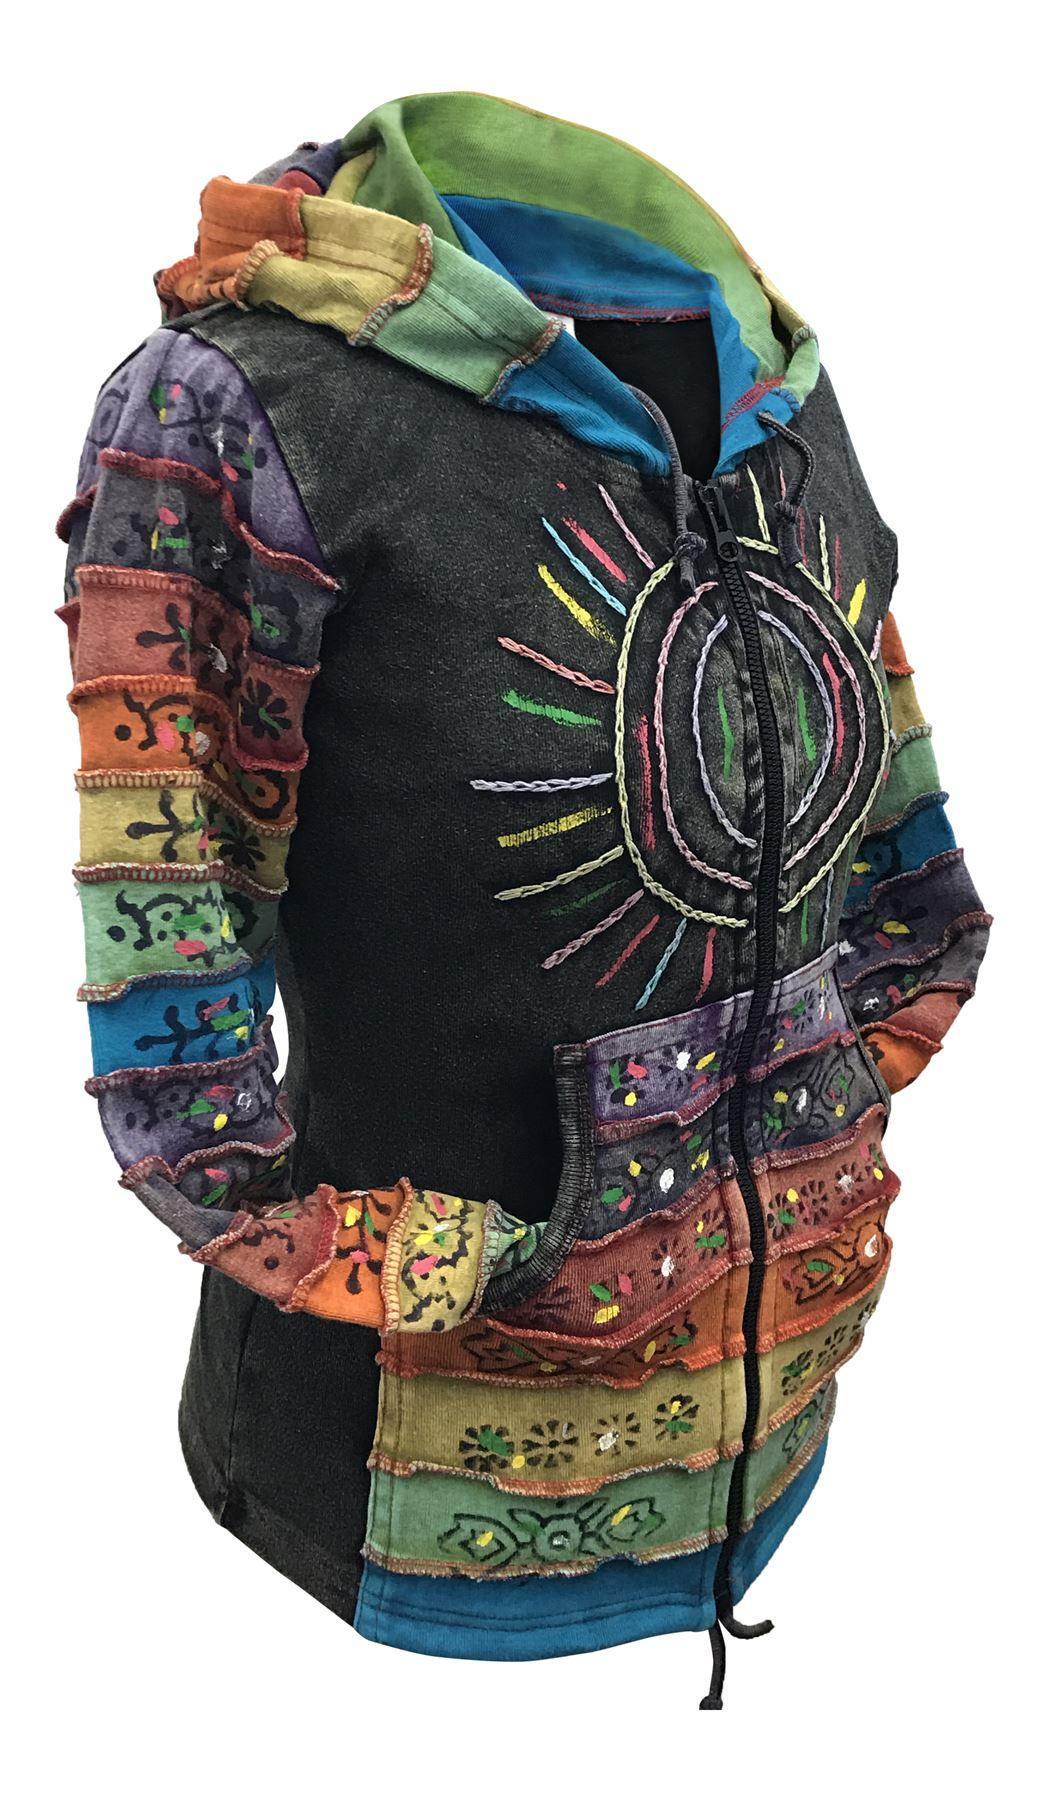 Women-039-s-Sun-Patchwork-Pixie-Hippy-Ribs-Hoodie-Light-Cotton-Hippie-Faded-Jacket thumbnail 3